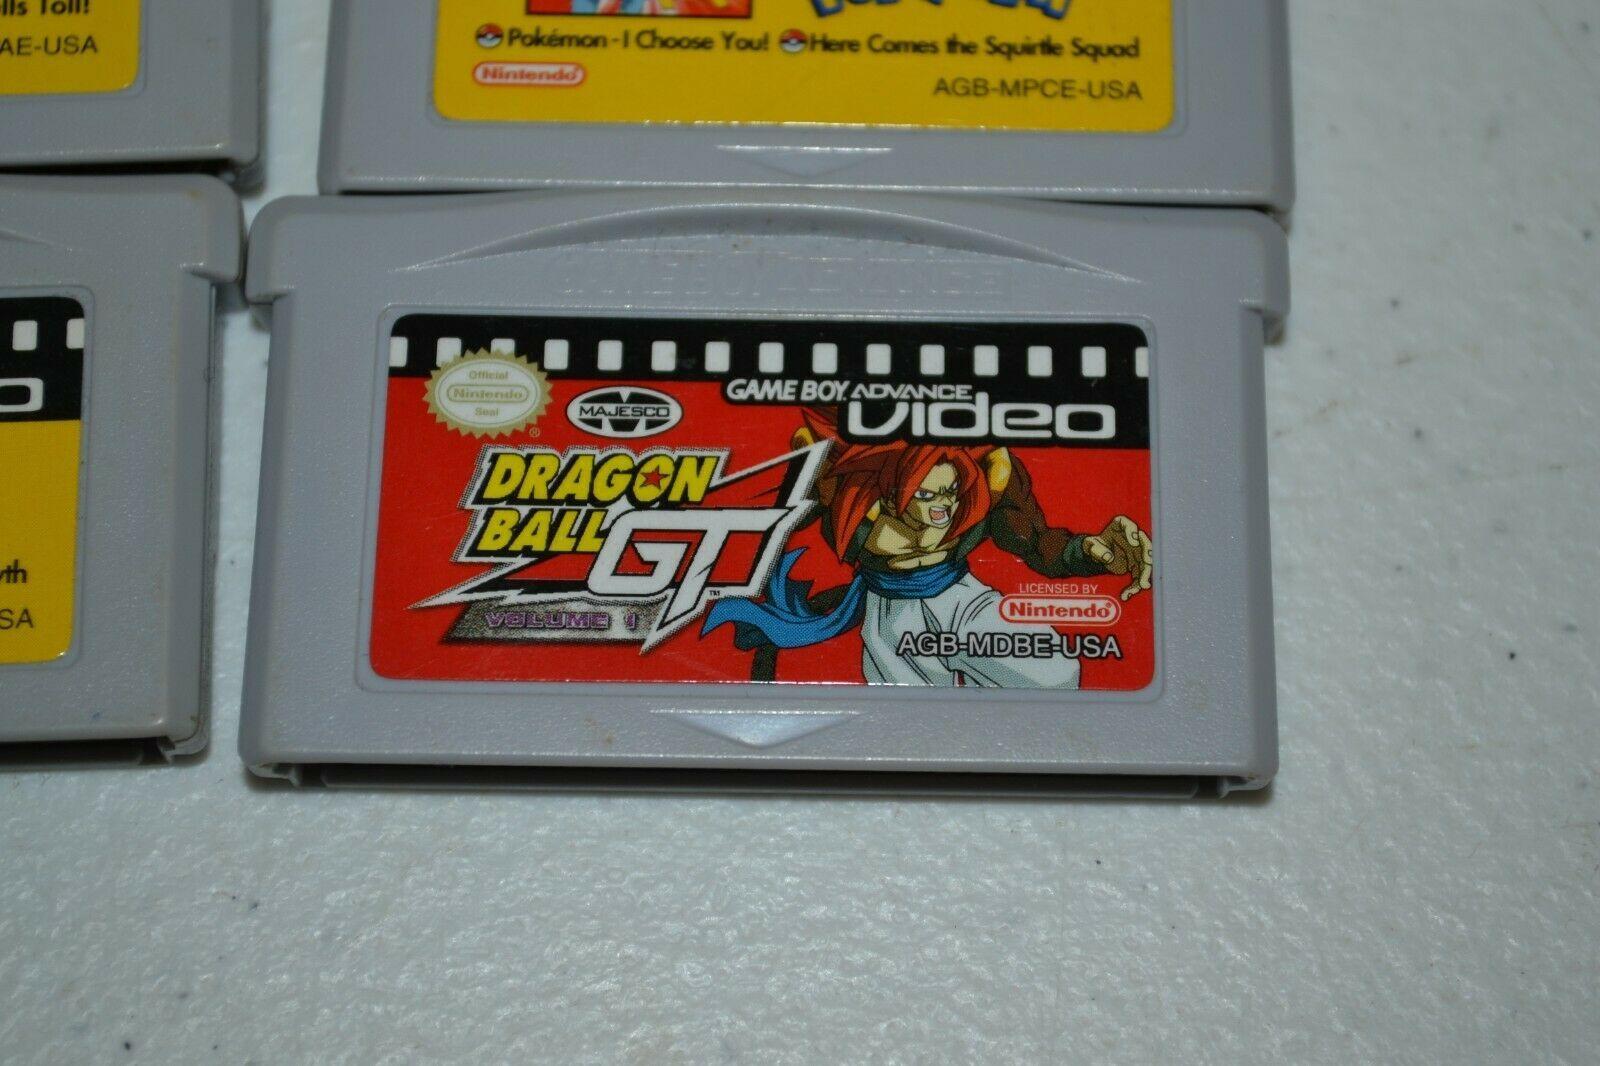 Pokemon Video Nintendo Game Boy Advance LOT of 3 Plus Dragonball GT GBA